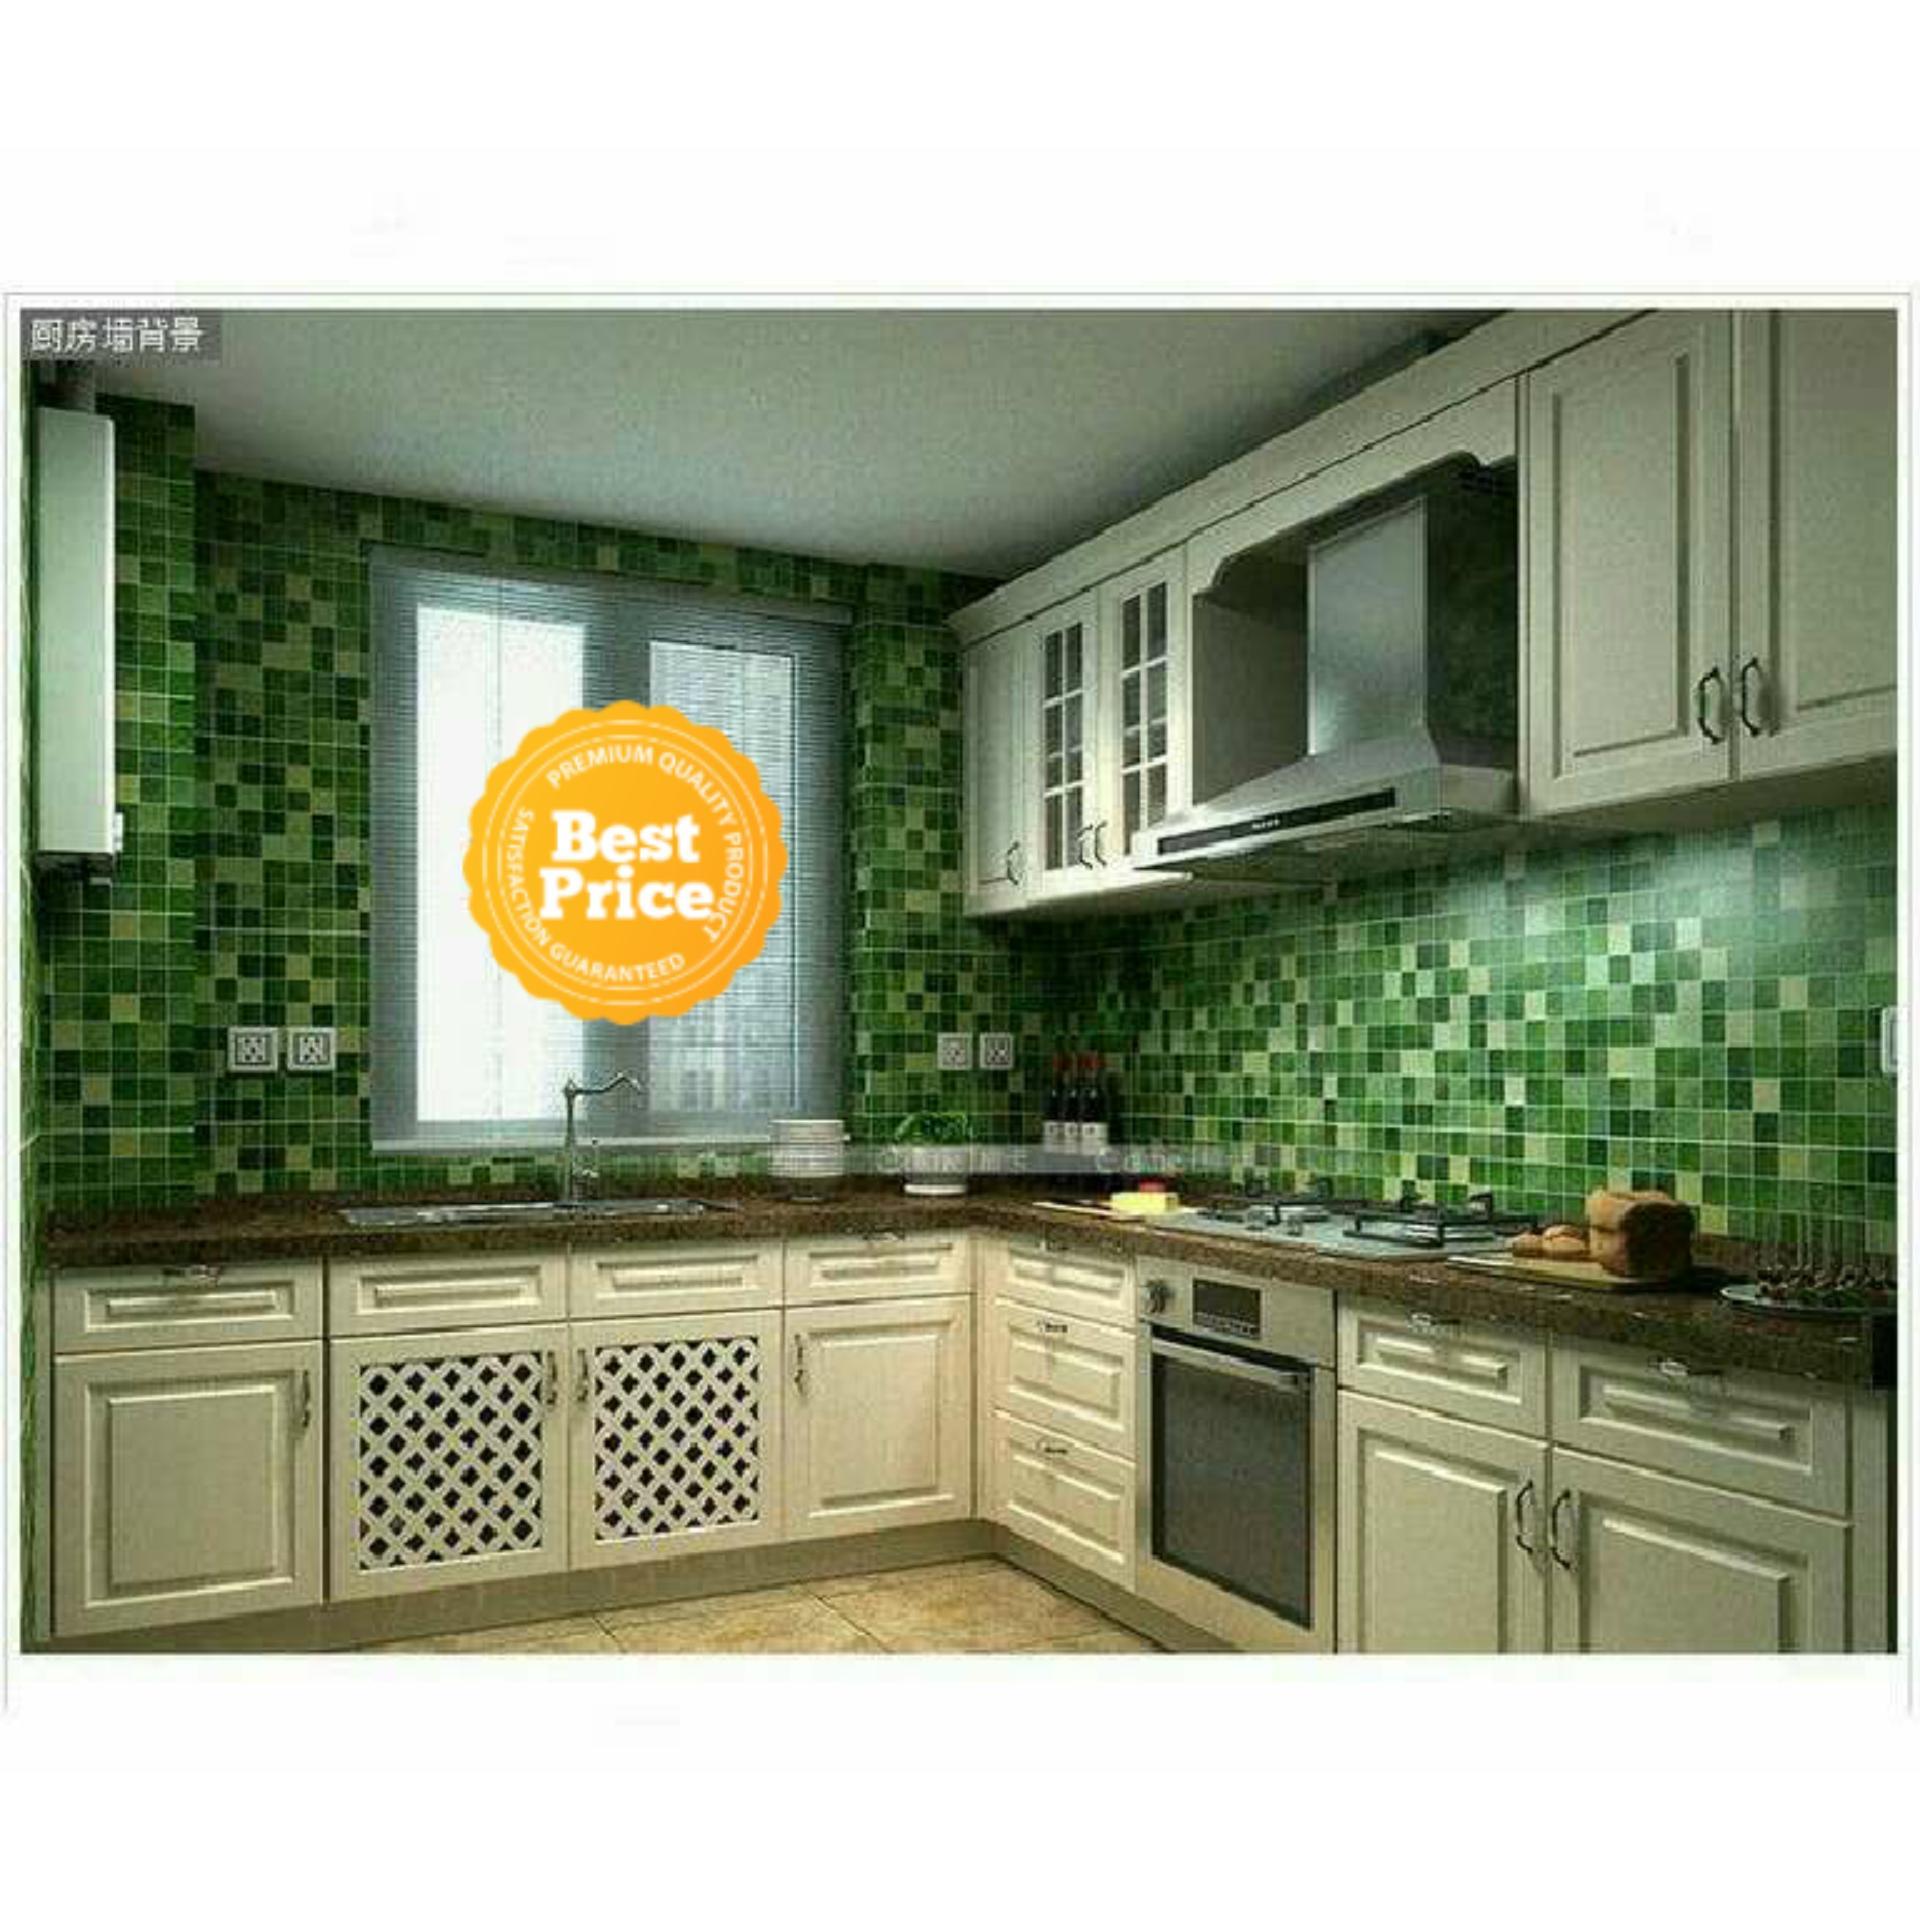 Wallpaper Sticker Dinding Kamar Mandi & Dapur Anti Keramik